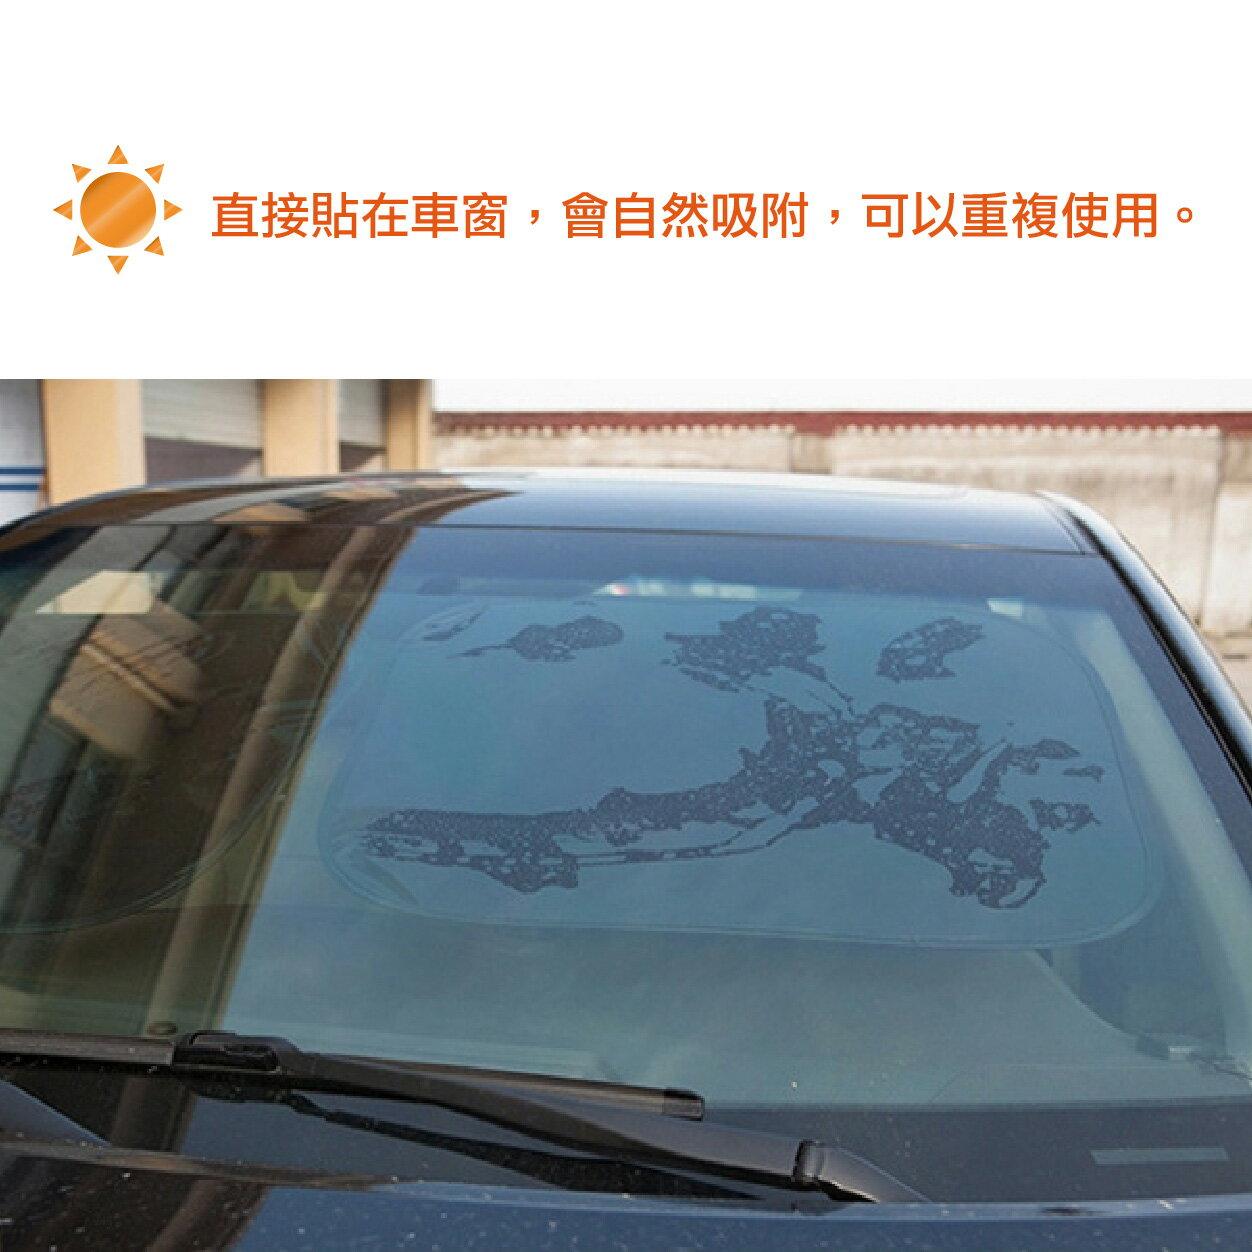 e系列汽車用品【靜電隔熱側遮】黑色靜電側遮 靜電膜 抗UV 遮陽擋光 1入